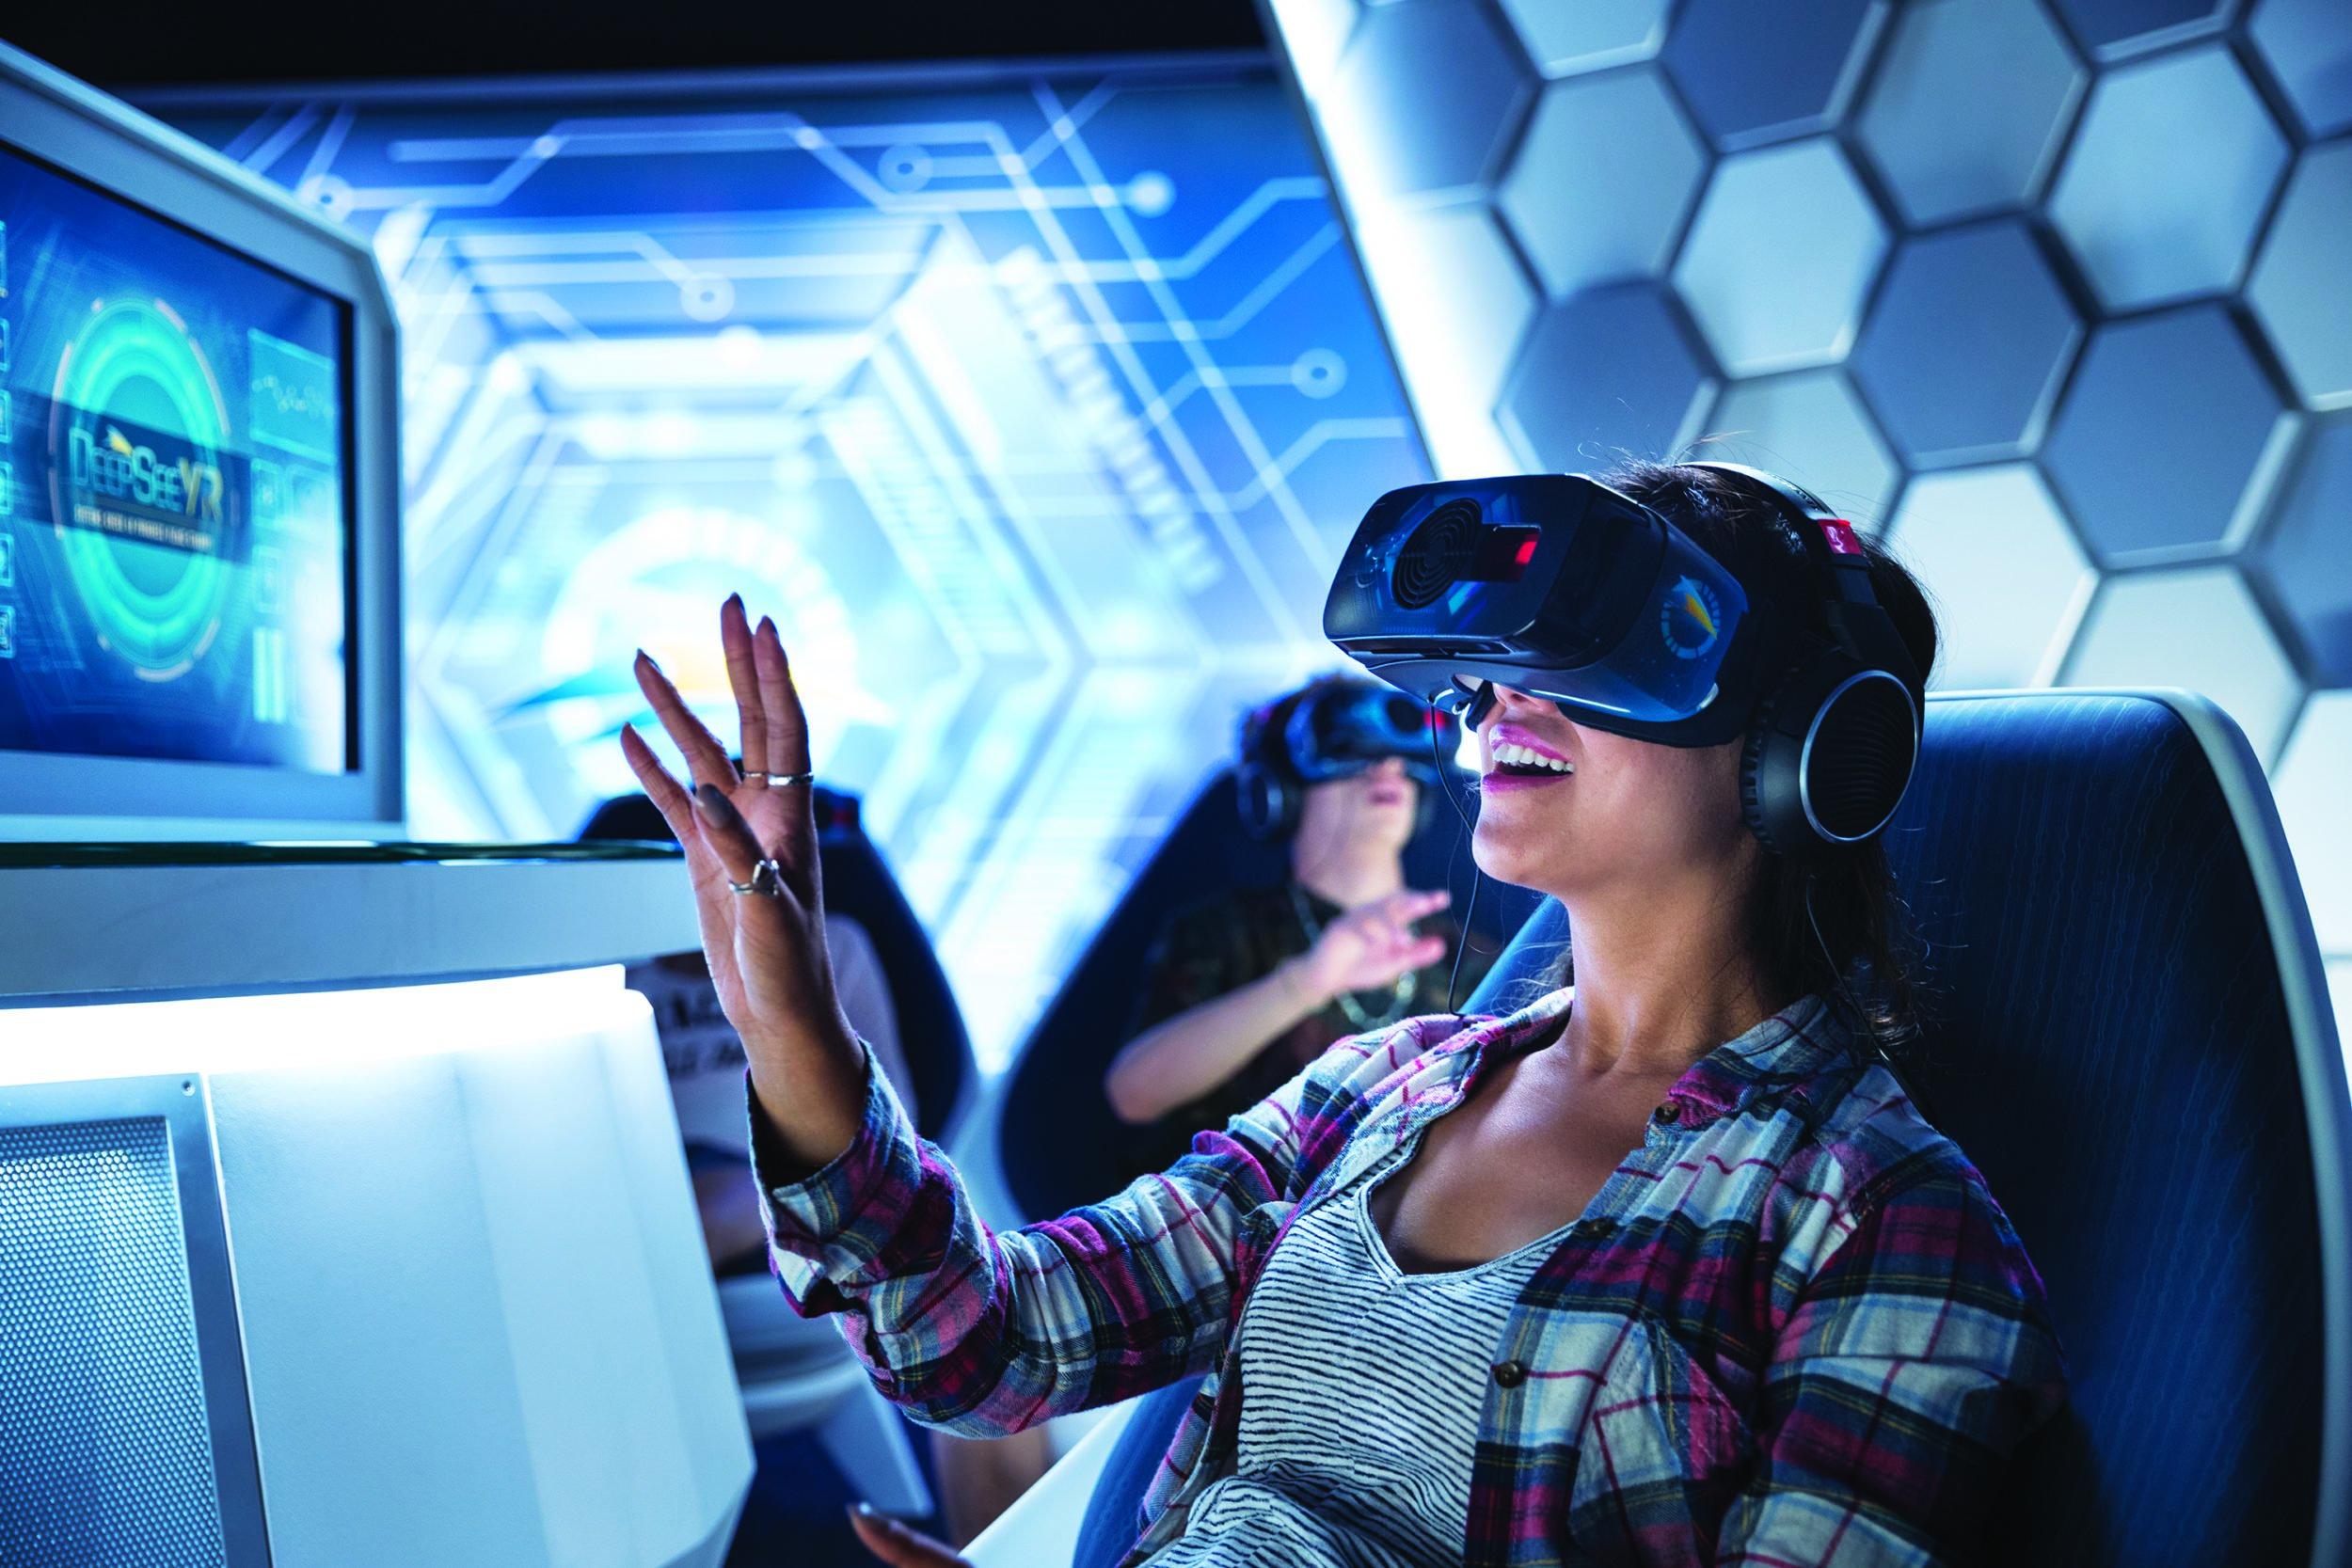 SeaWorld San Diego with teens and tweens: DeepSEE VR: Orca 360